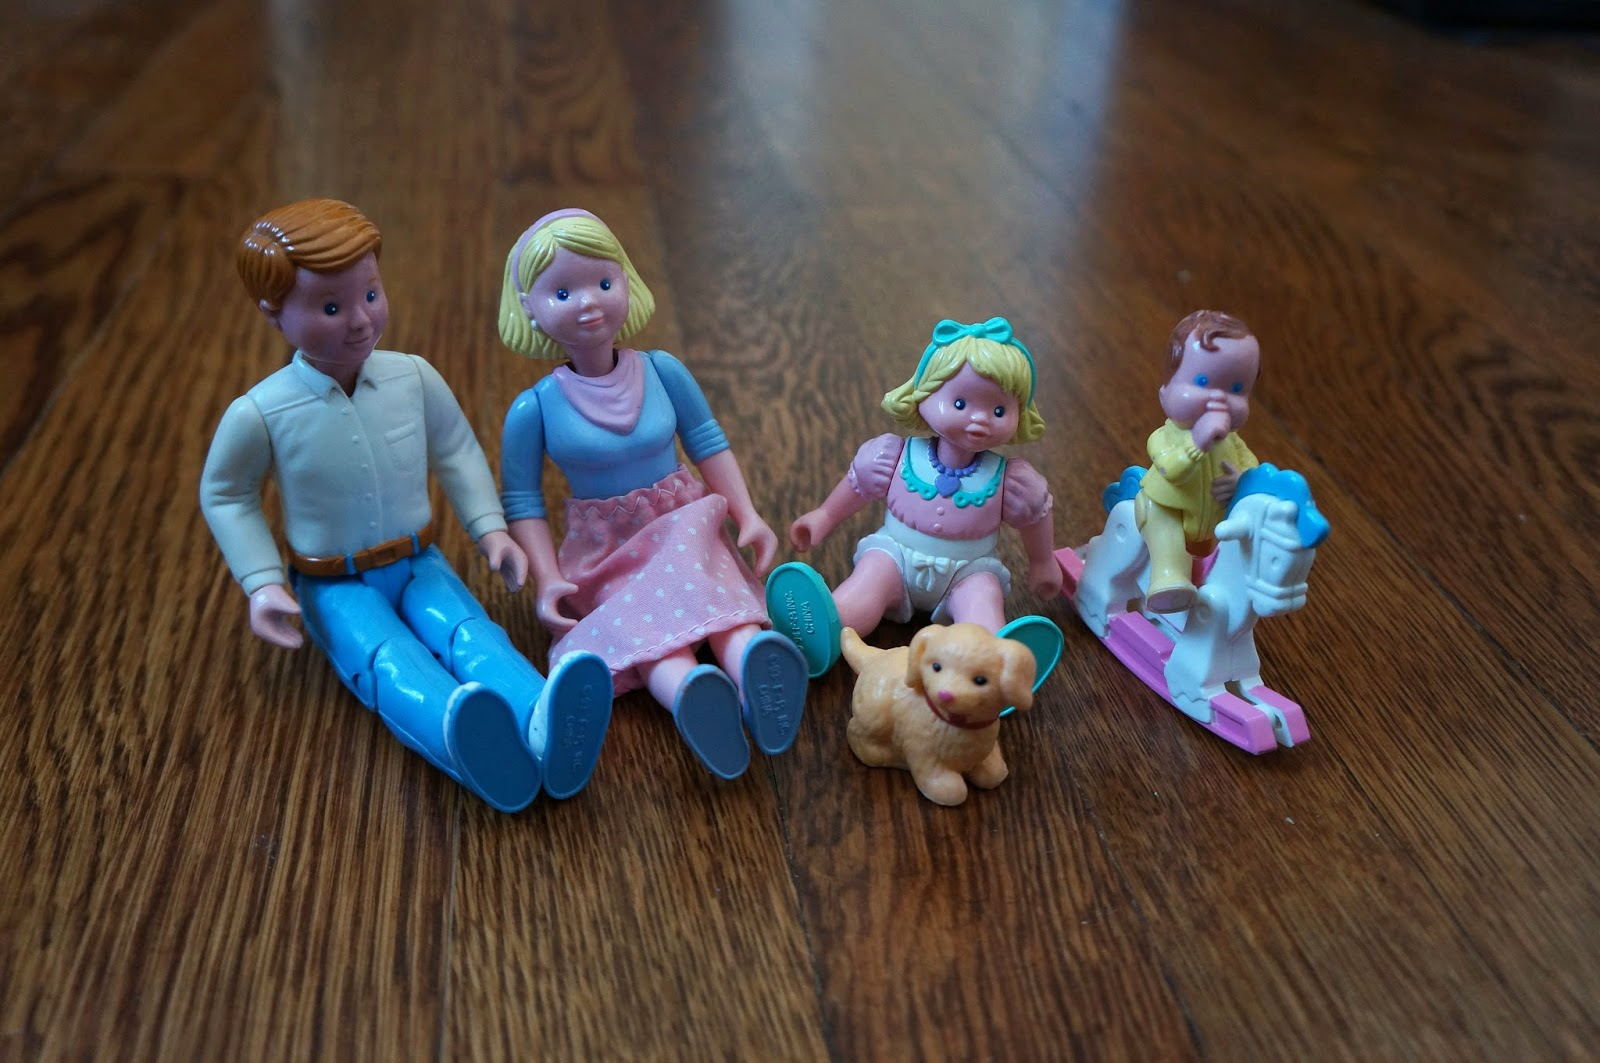 Vintage Toys 3- Fisher Price Loving Family dolls